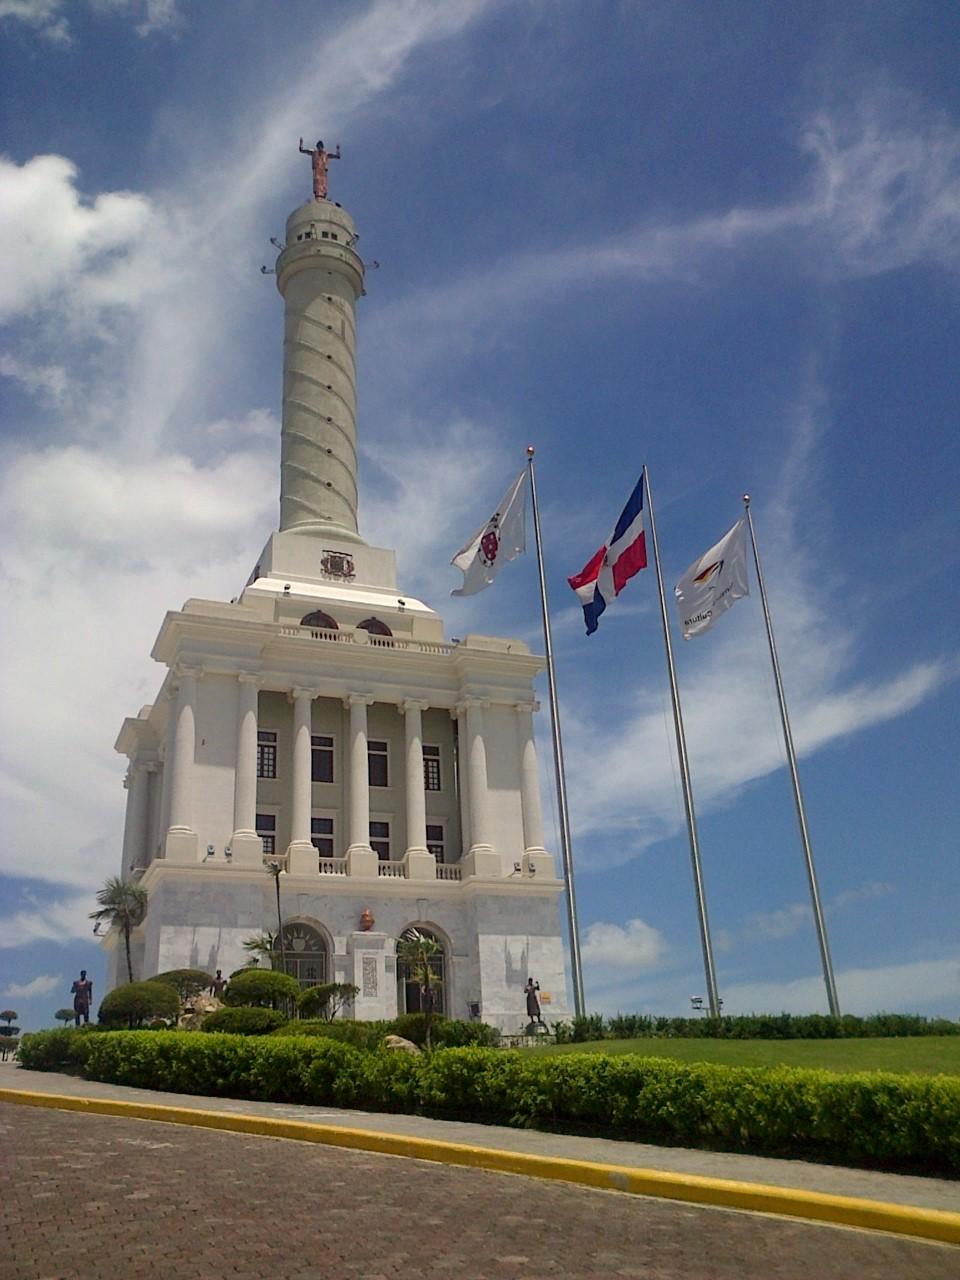 Cultura espera entrega de la sentencia íntegra sobre Litis en monumento de Santiago